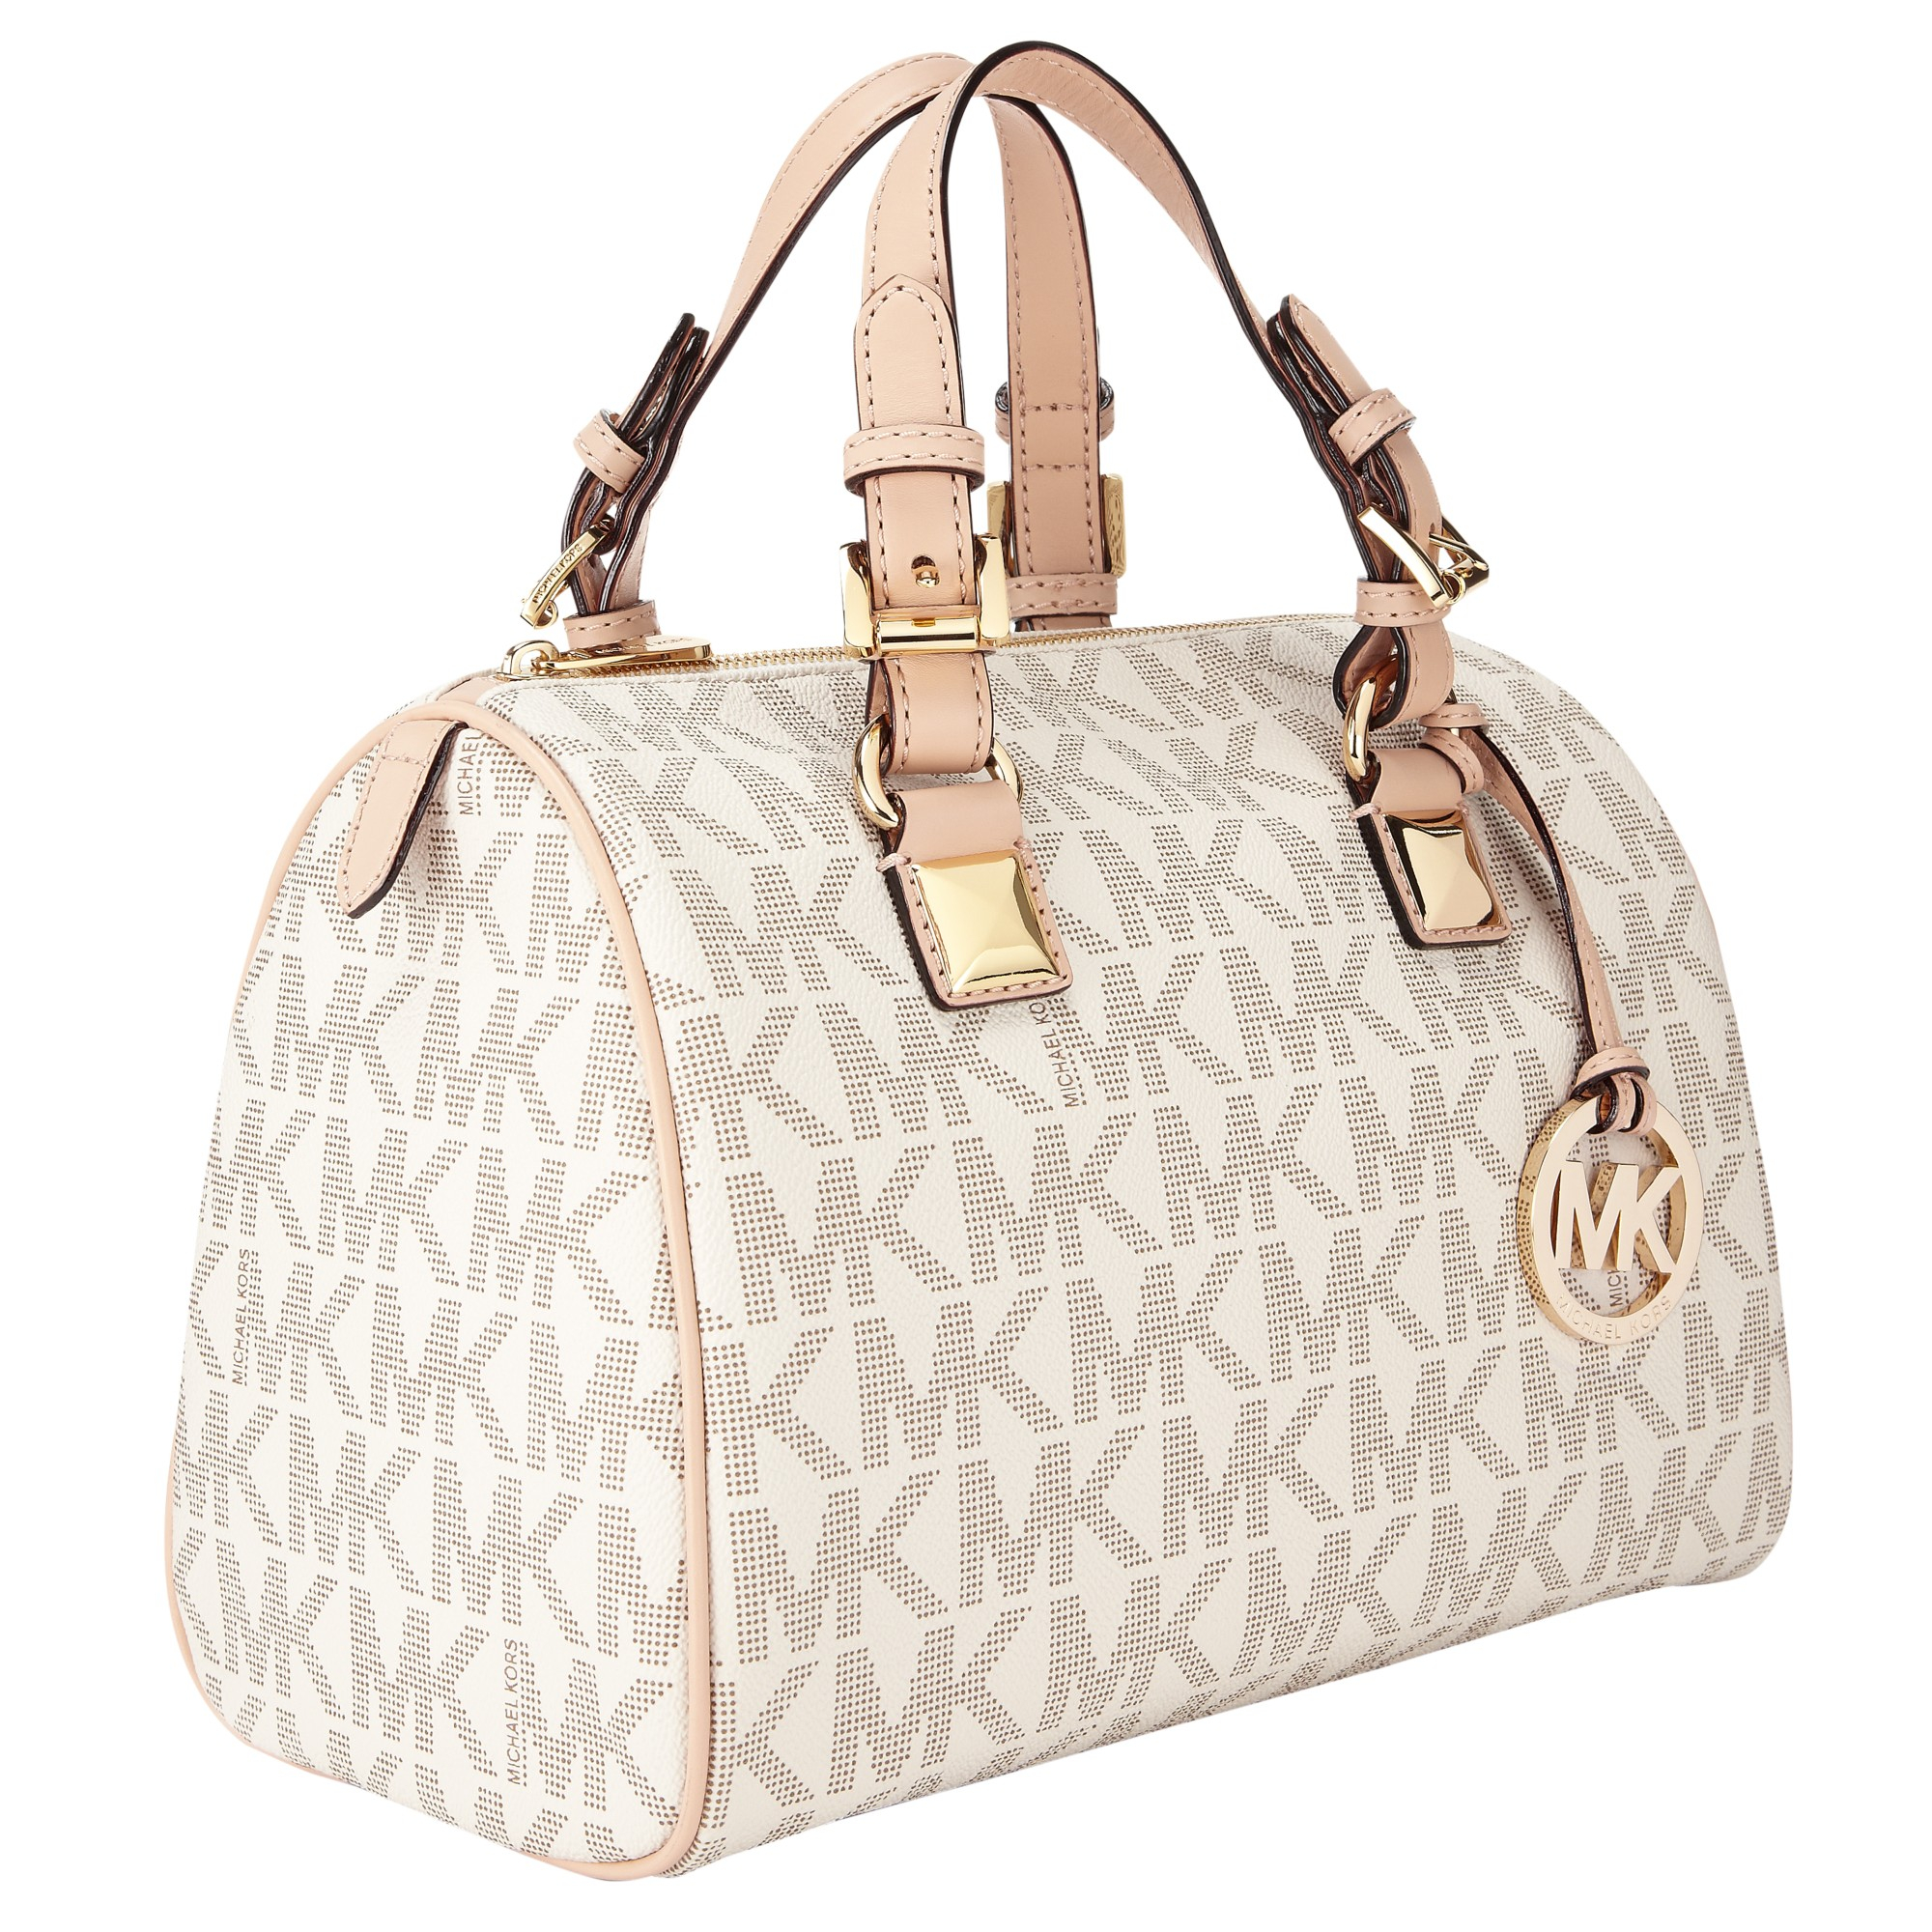 3ab053bbcce23e new zealand michael kors handbags john lewis best handbag 2017 d3fda c10f9